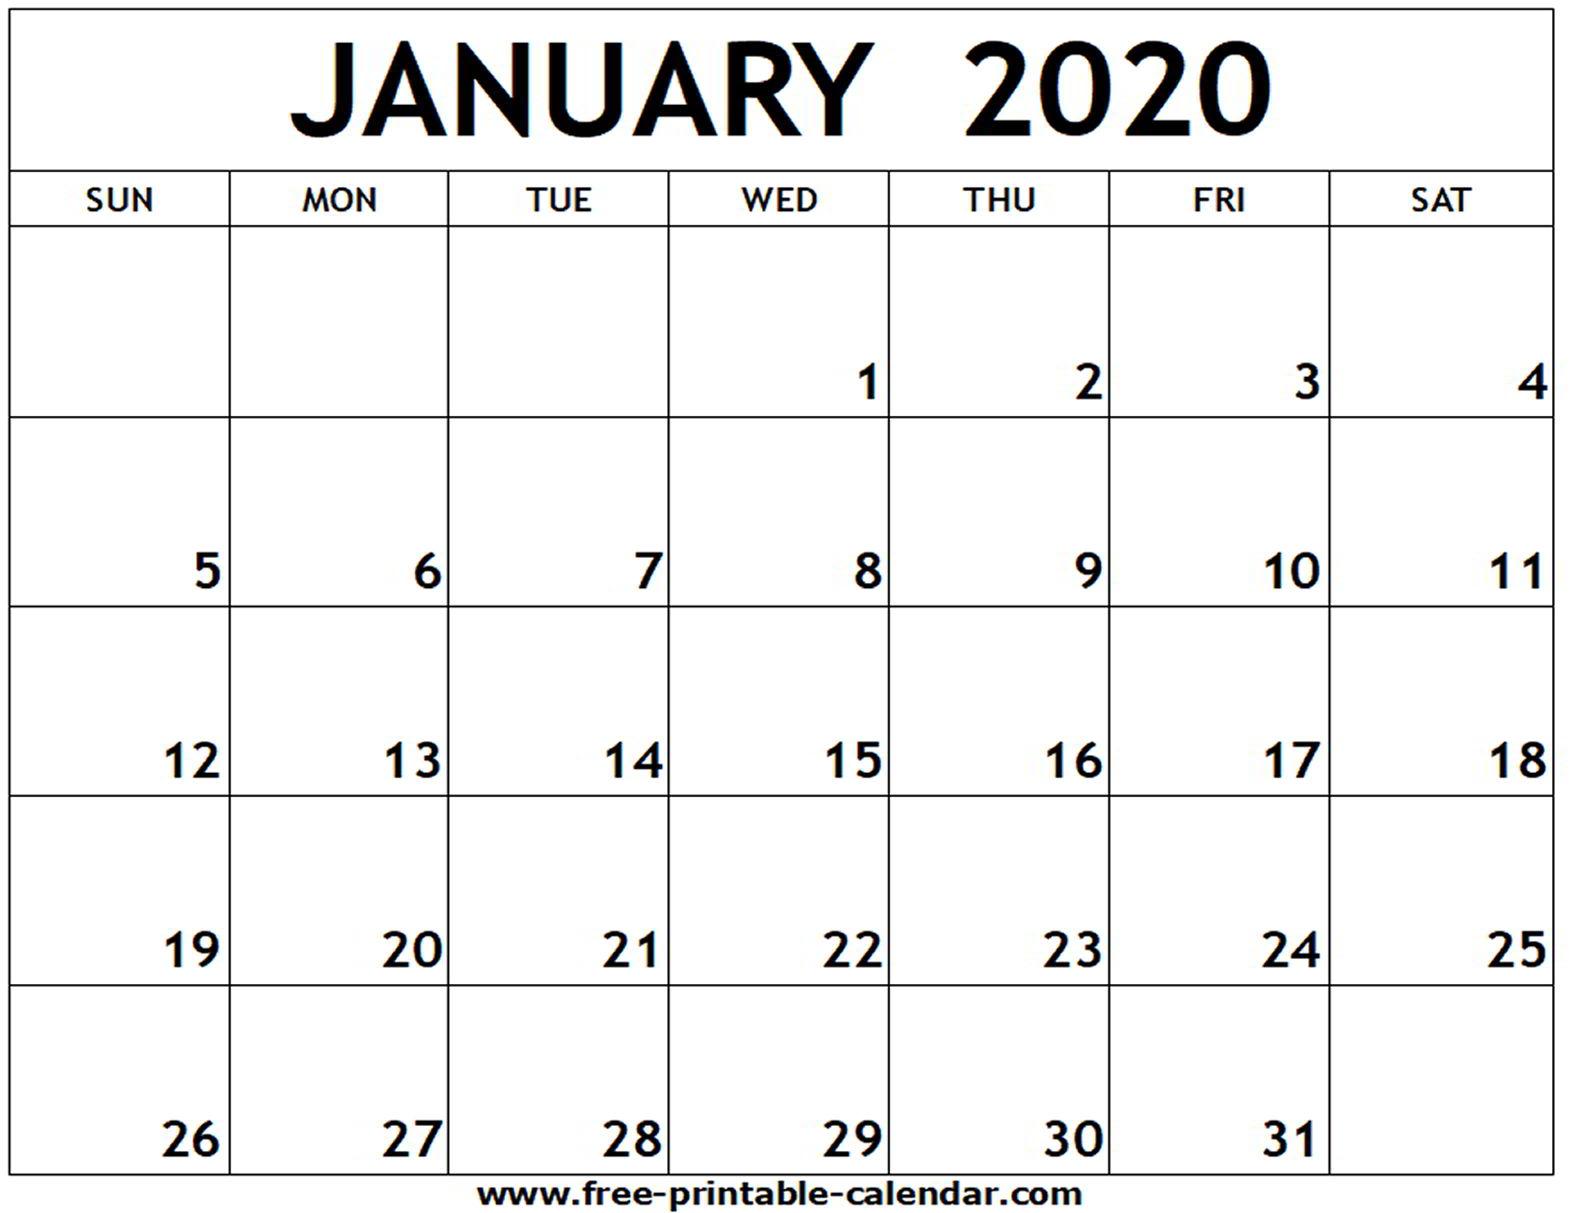 Print Calendar Free 2020 - Wpa.wpart.co